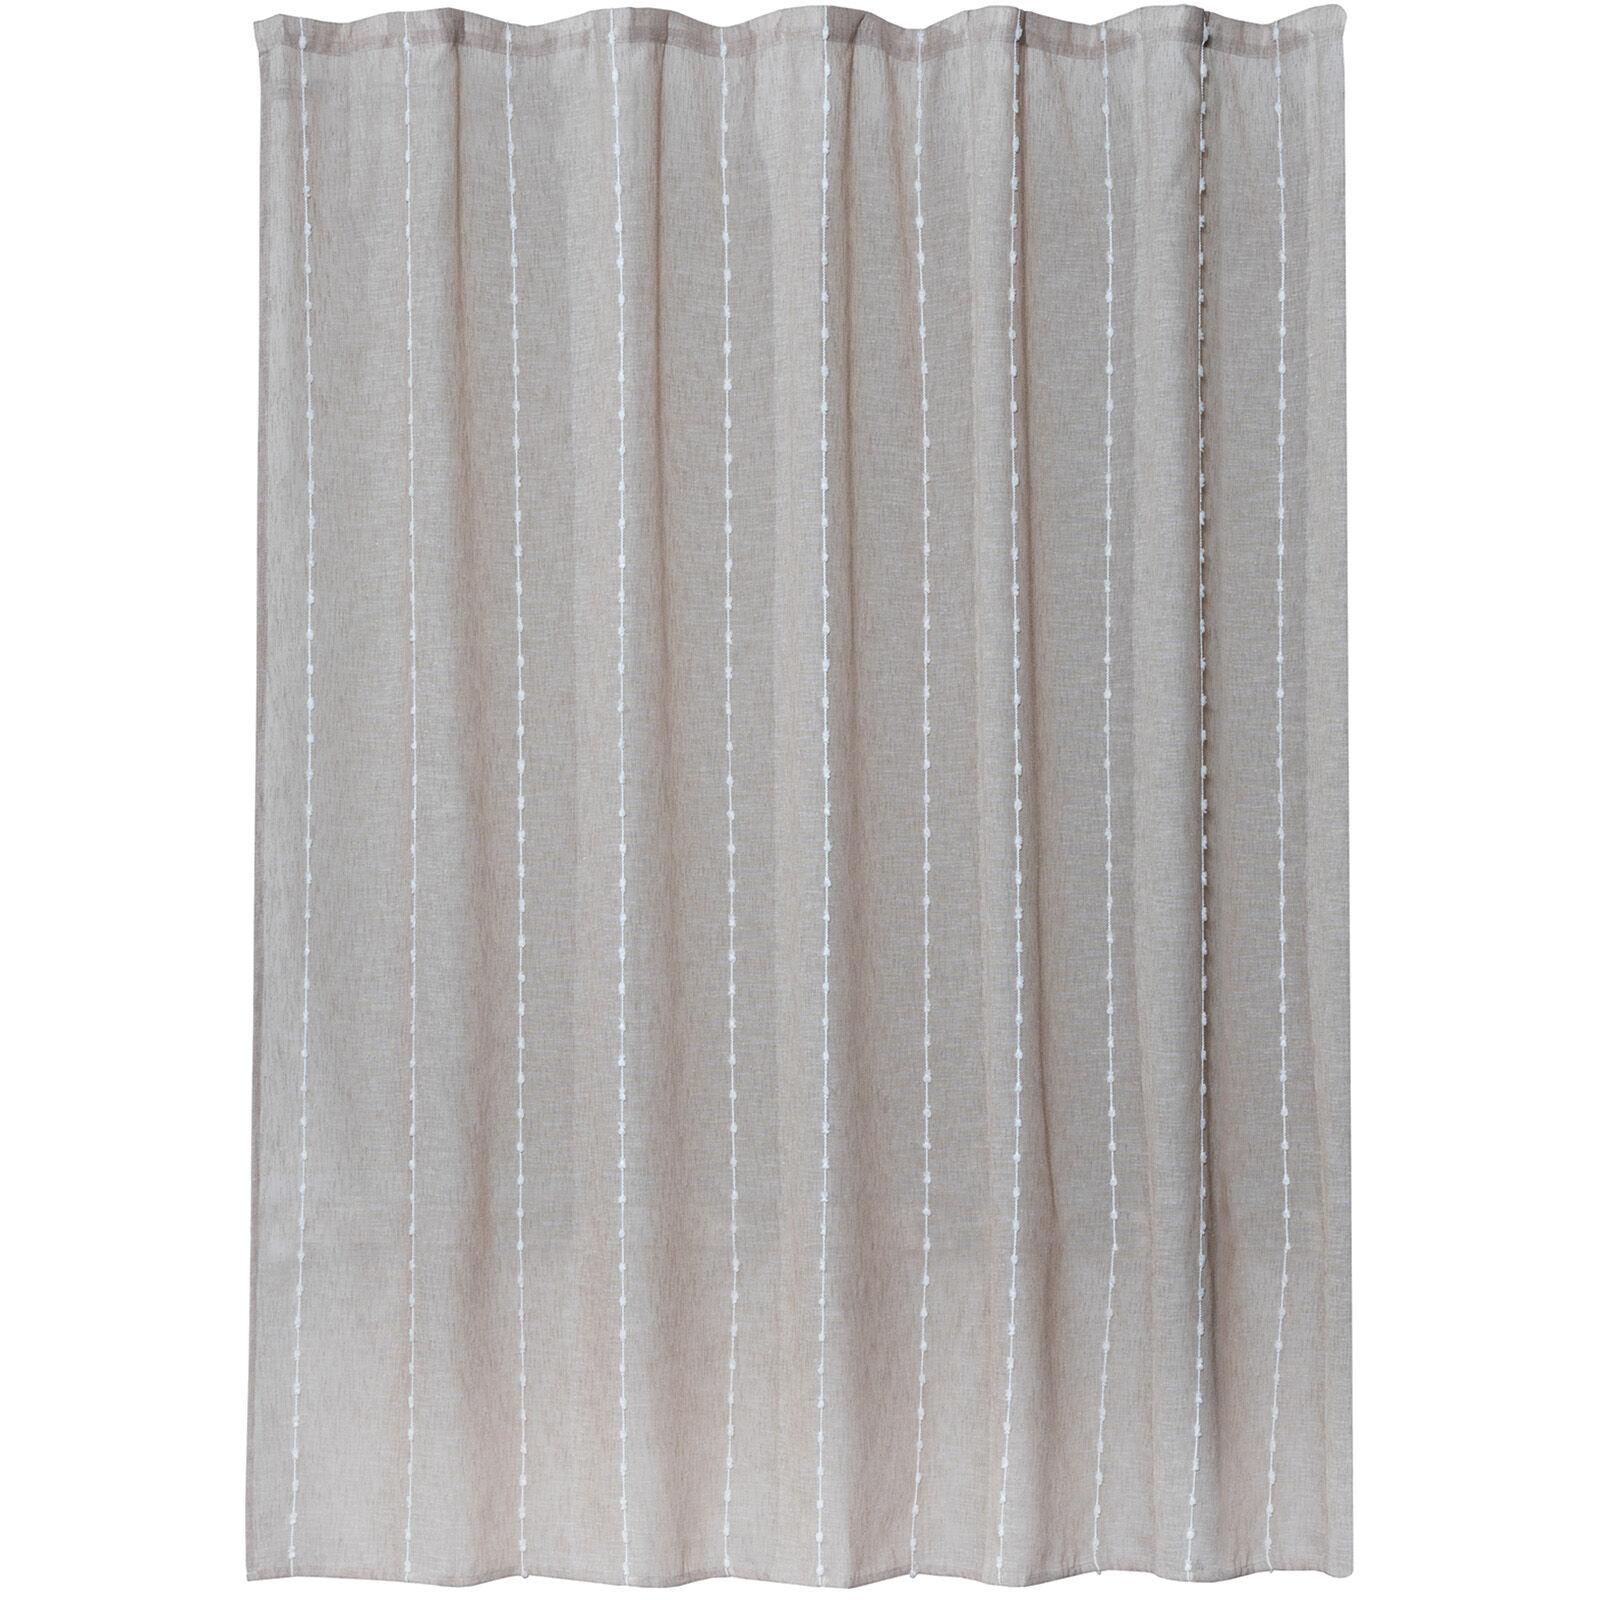 Pom Pom Stripes Shower Curtain At Home